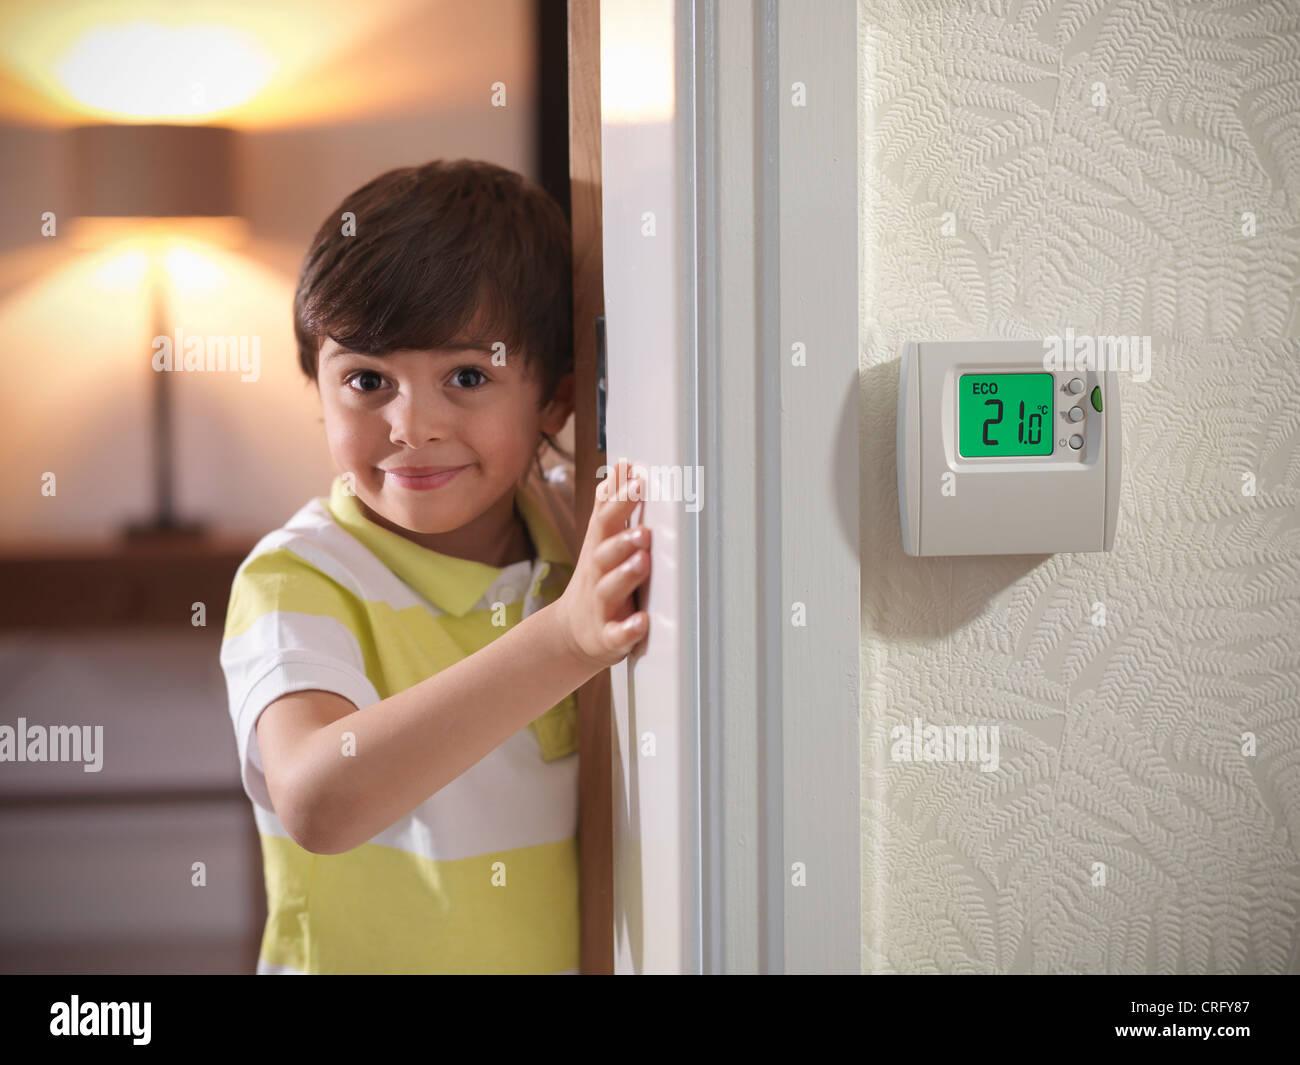 Boy peeking around doorway - Stock Image